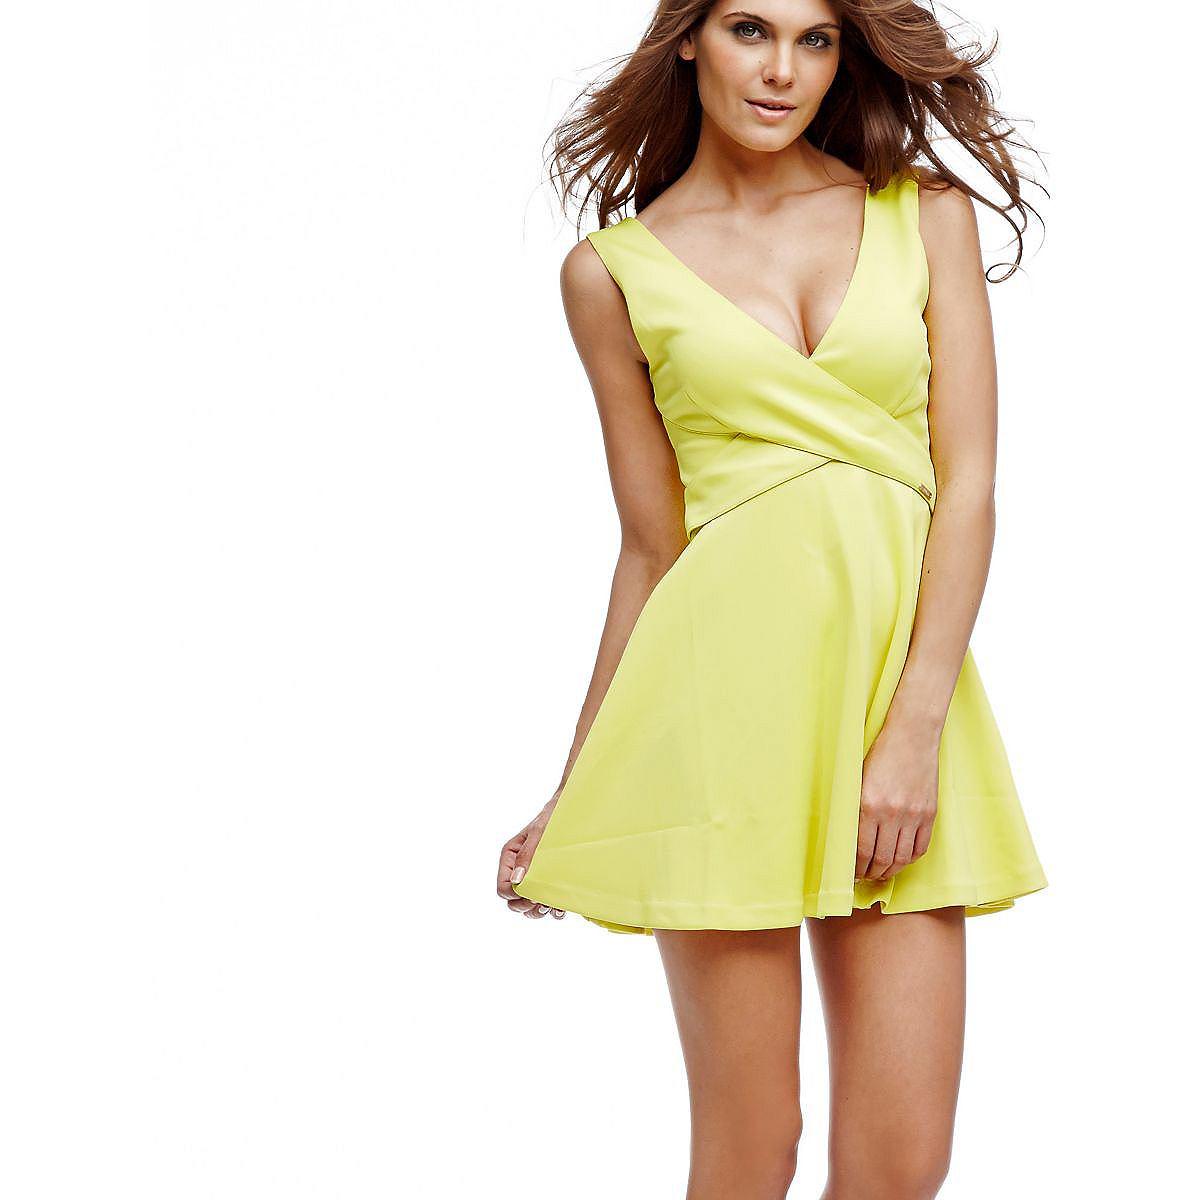 Guess jurk met cirkelrok geel